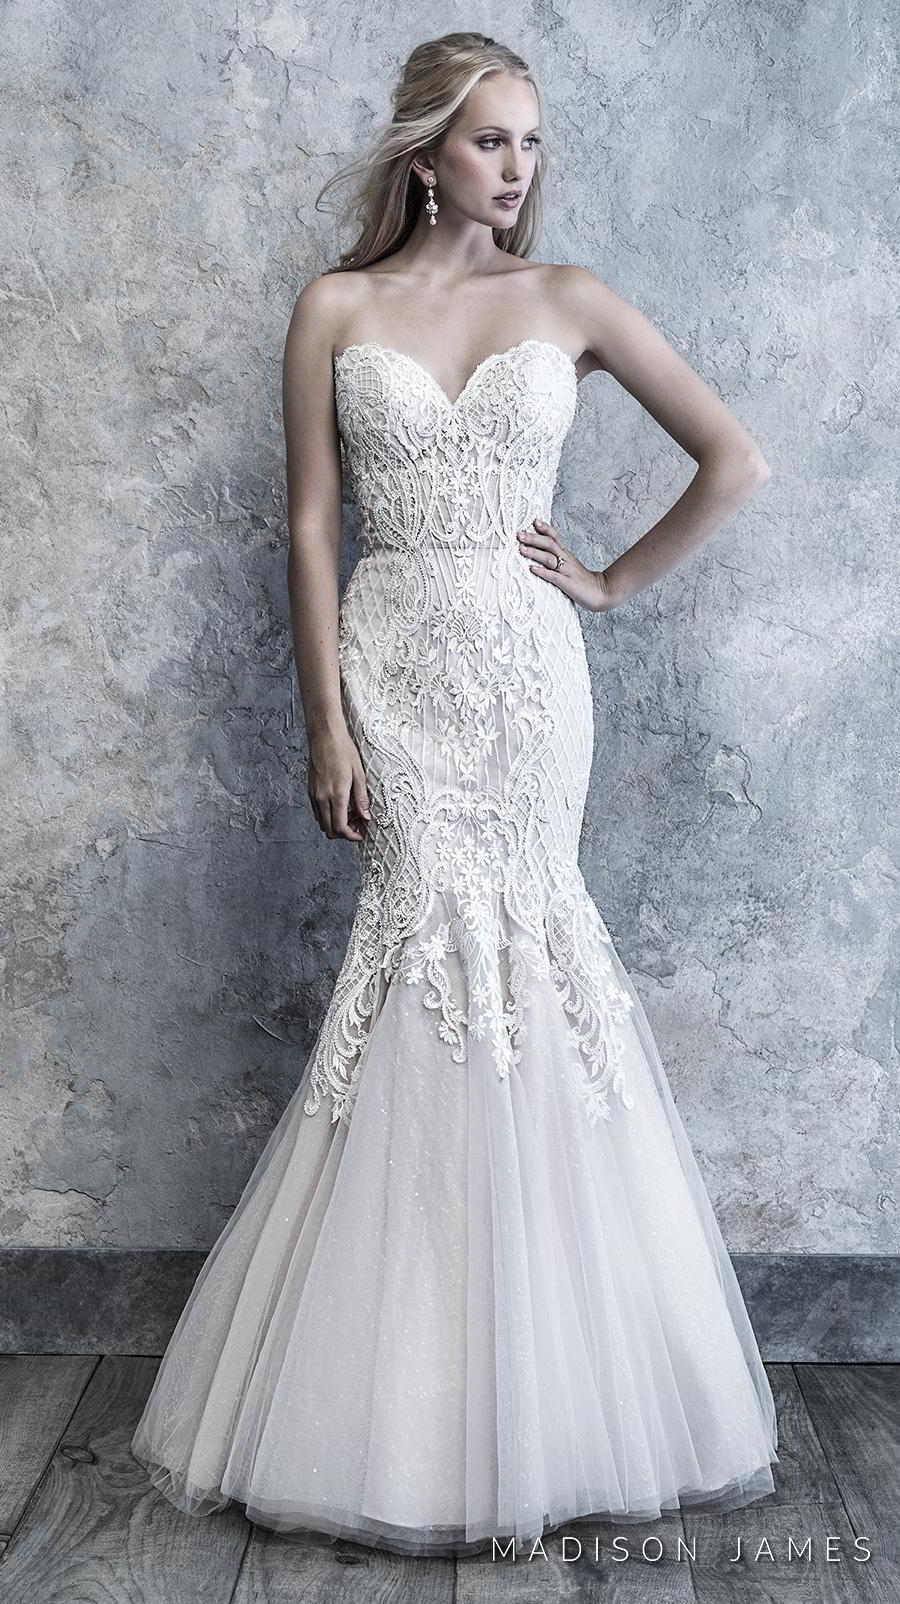 madison james 2019 bridal strapless sweetheart neckline heavily embellished bodice romantic mermaid wedding dress mid back chapel train (505) mv